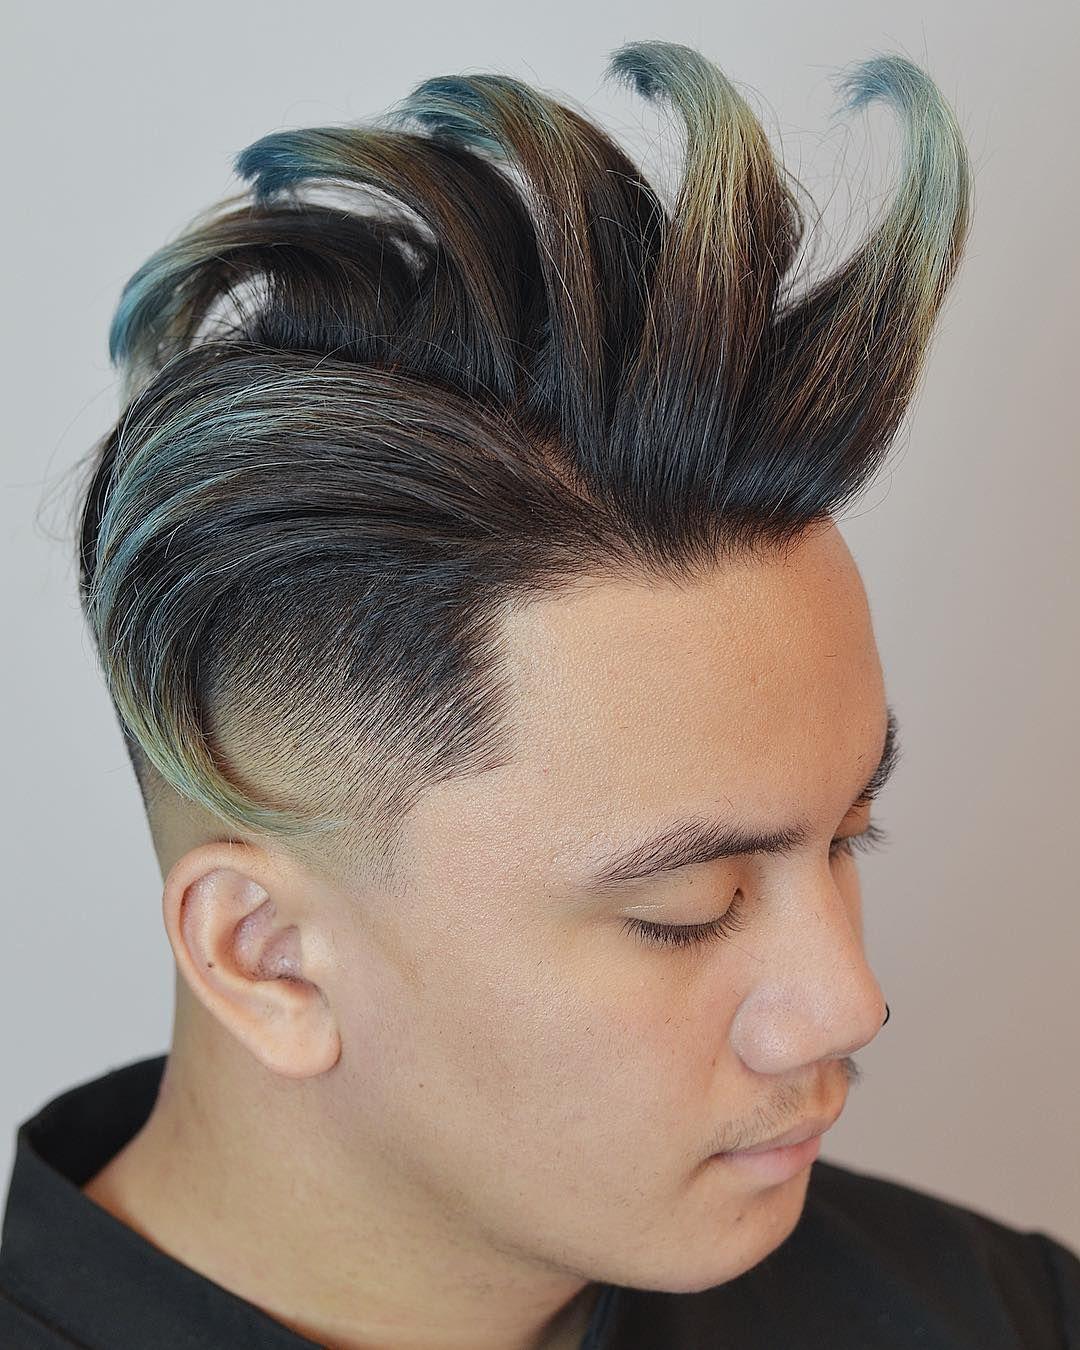 Mens haircut diagram  cool and trendy faux hawk styles  hair  pinterest  faux hawk